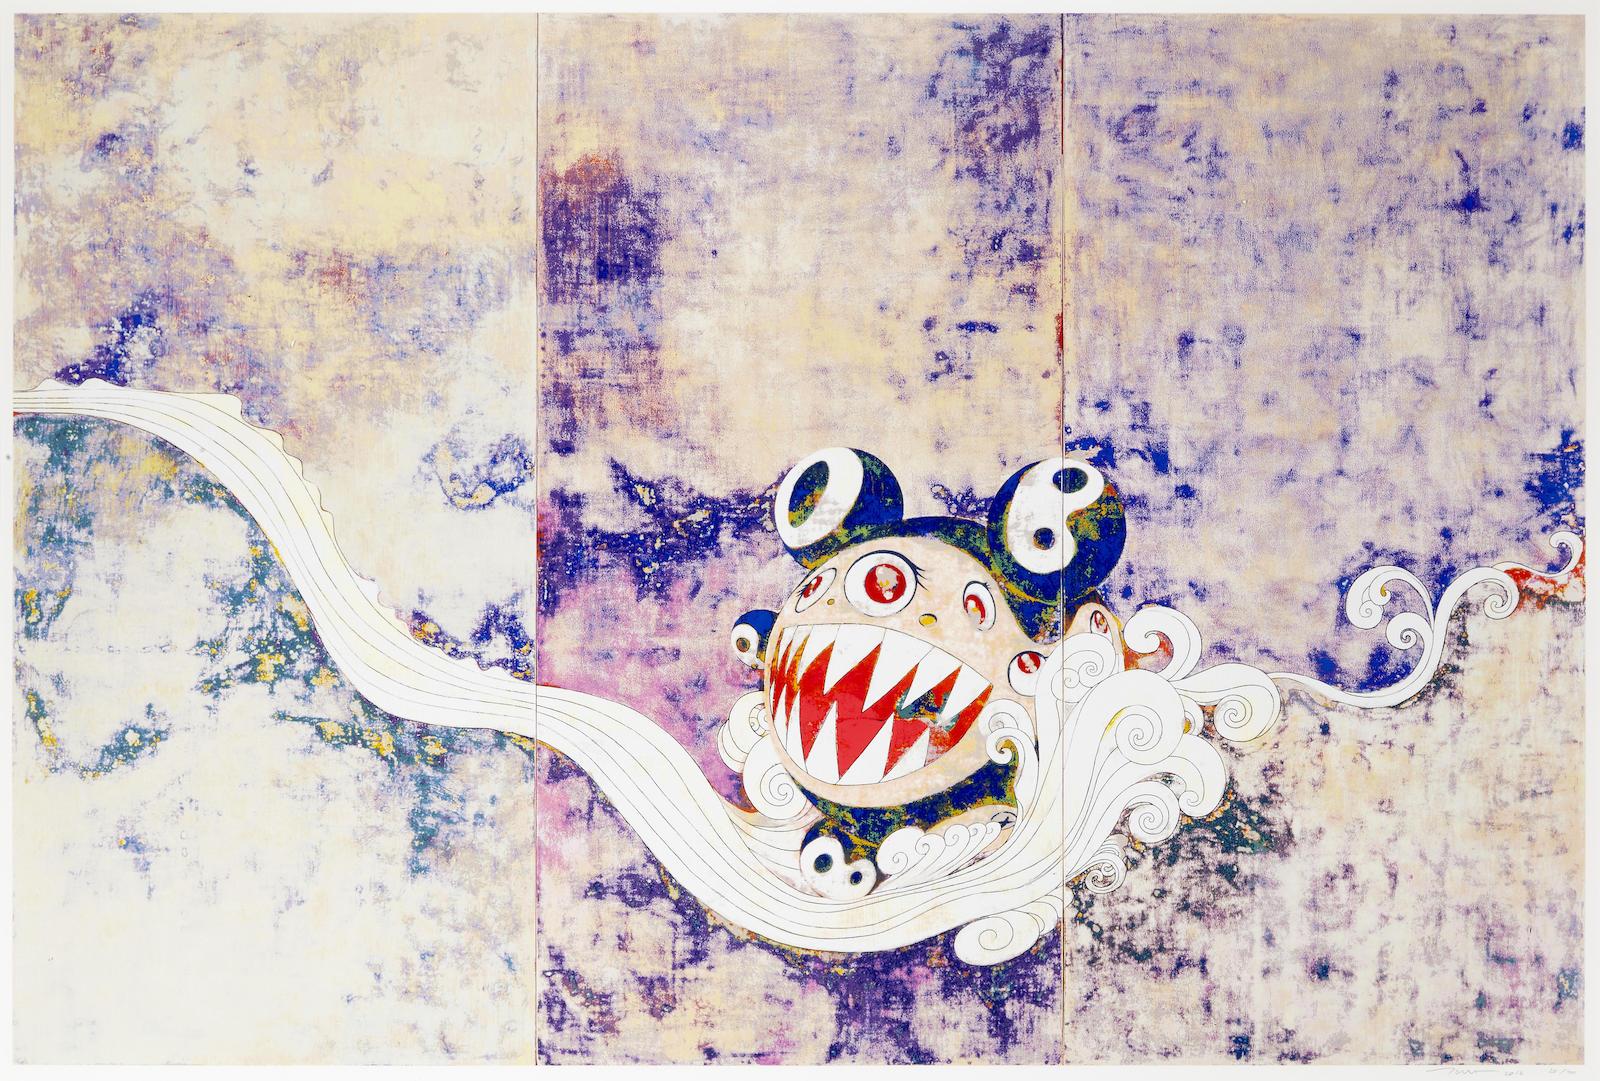 Takashi Murakami-727-2016